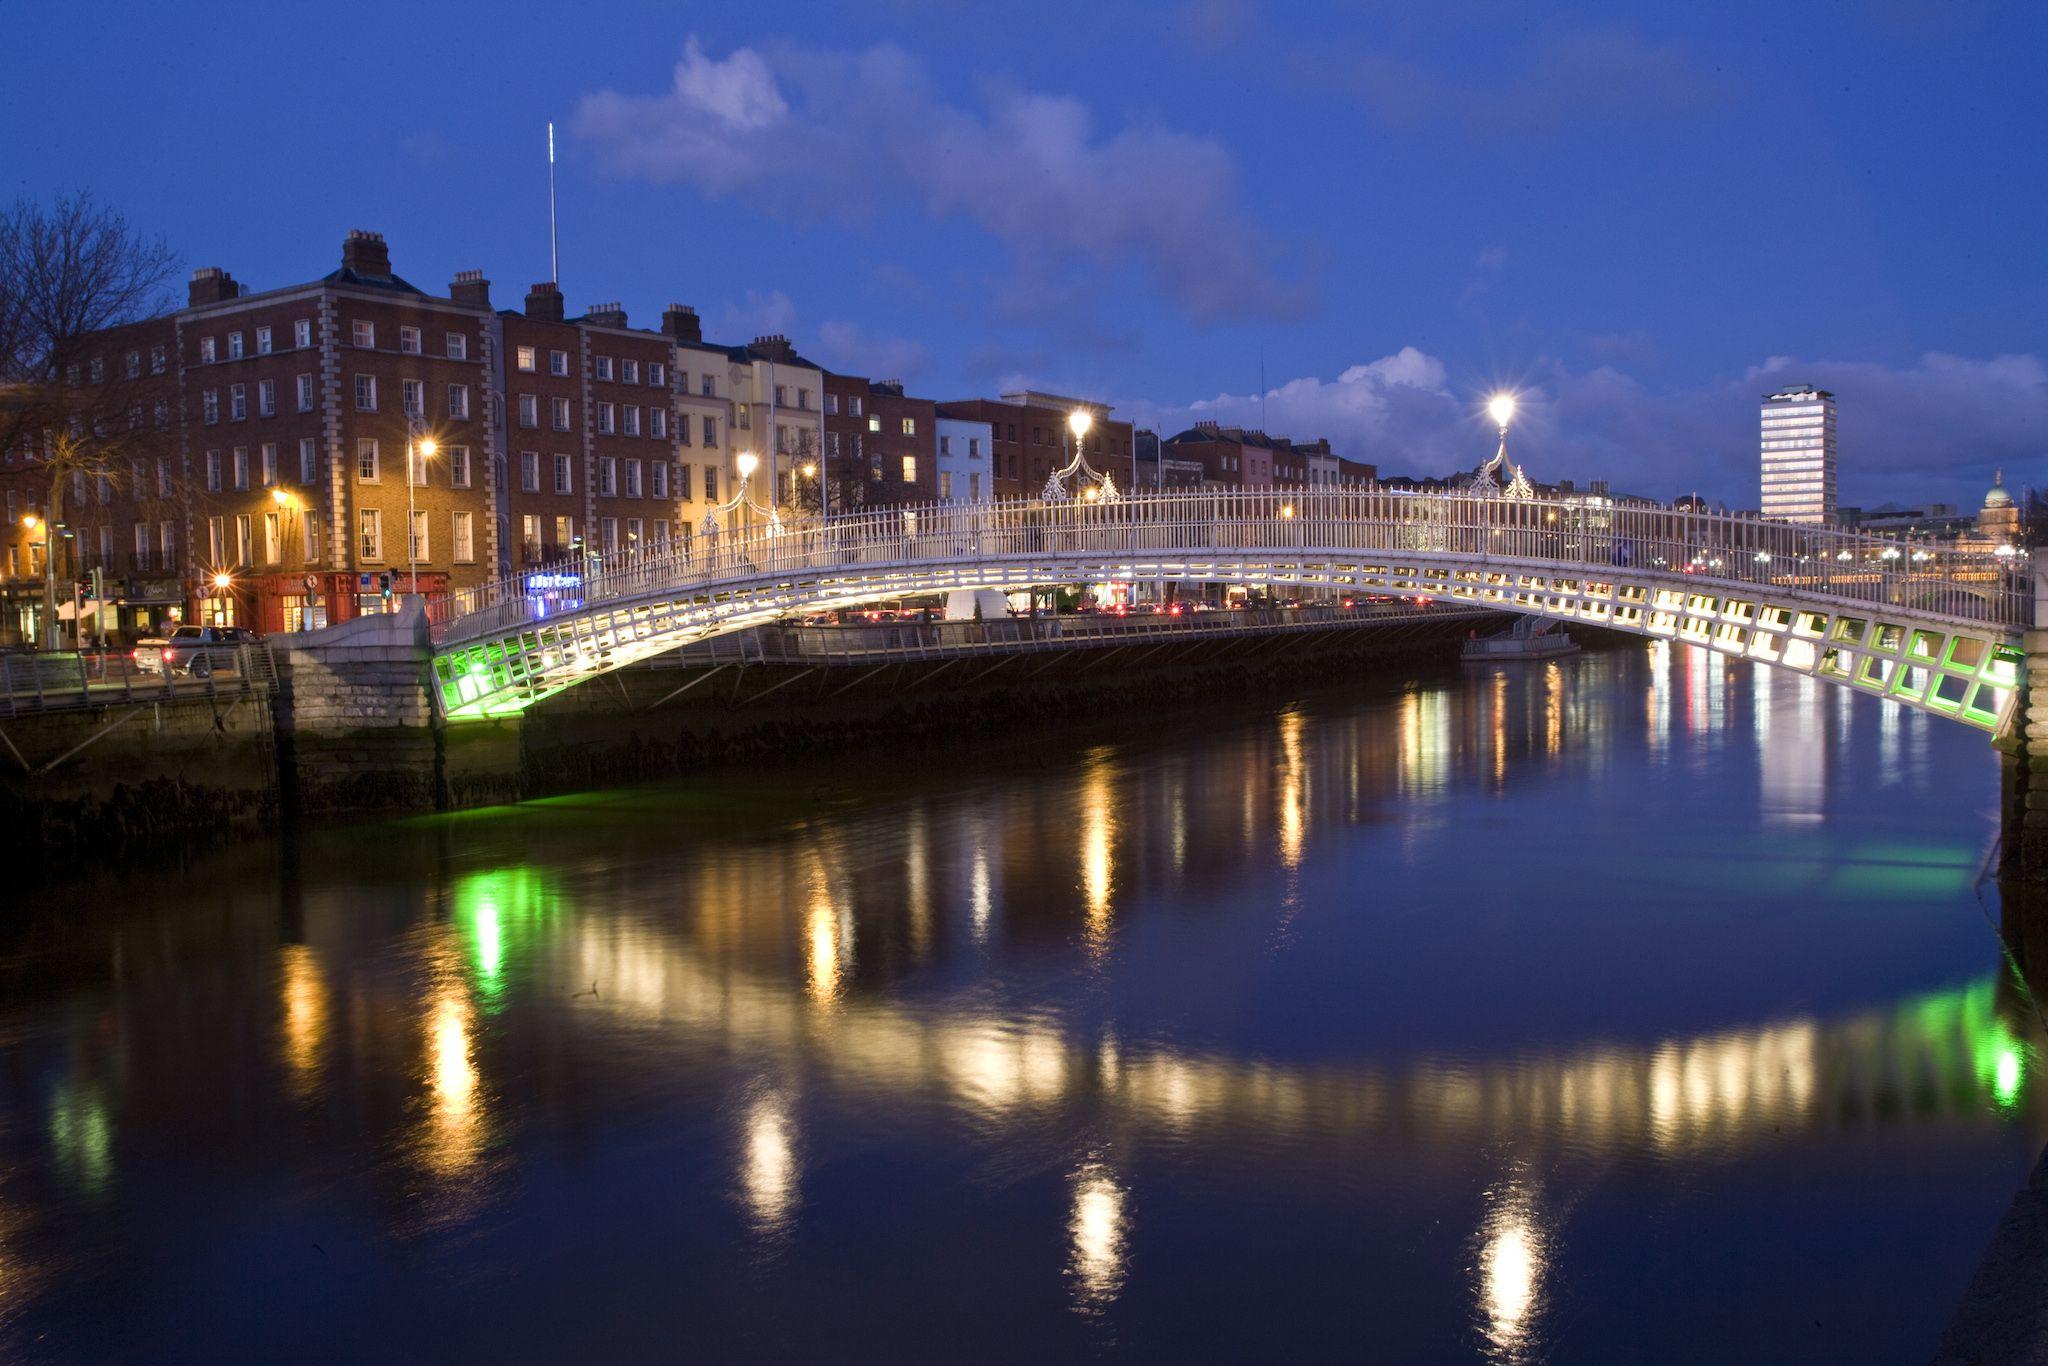 Night shot of River Liffey; Ha'penny bridge; dublin city